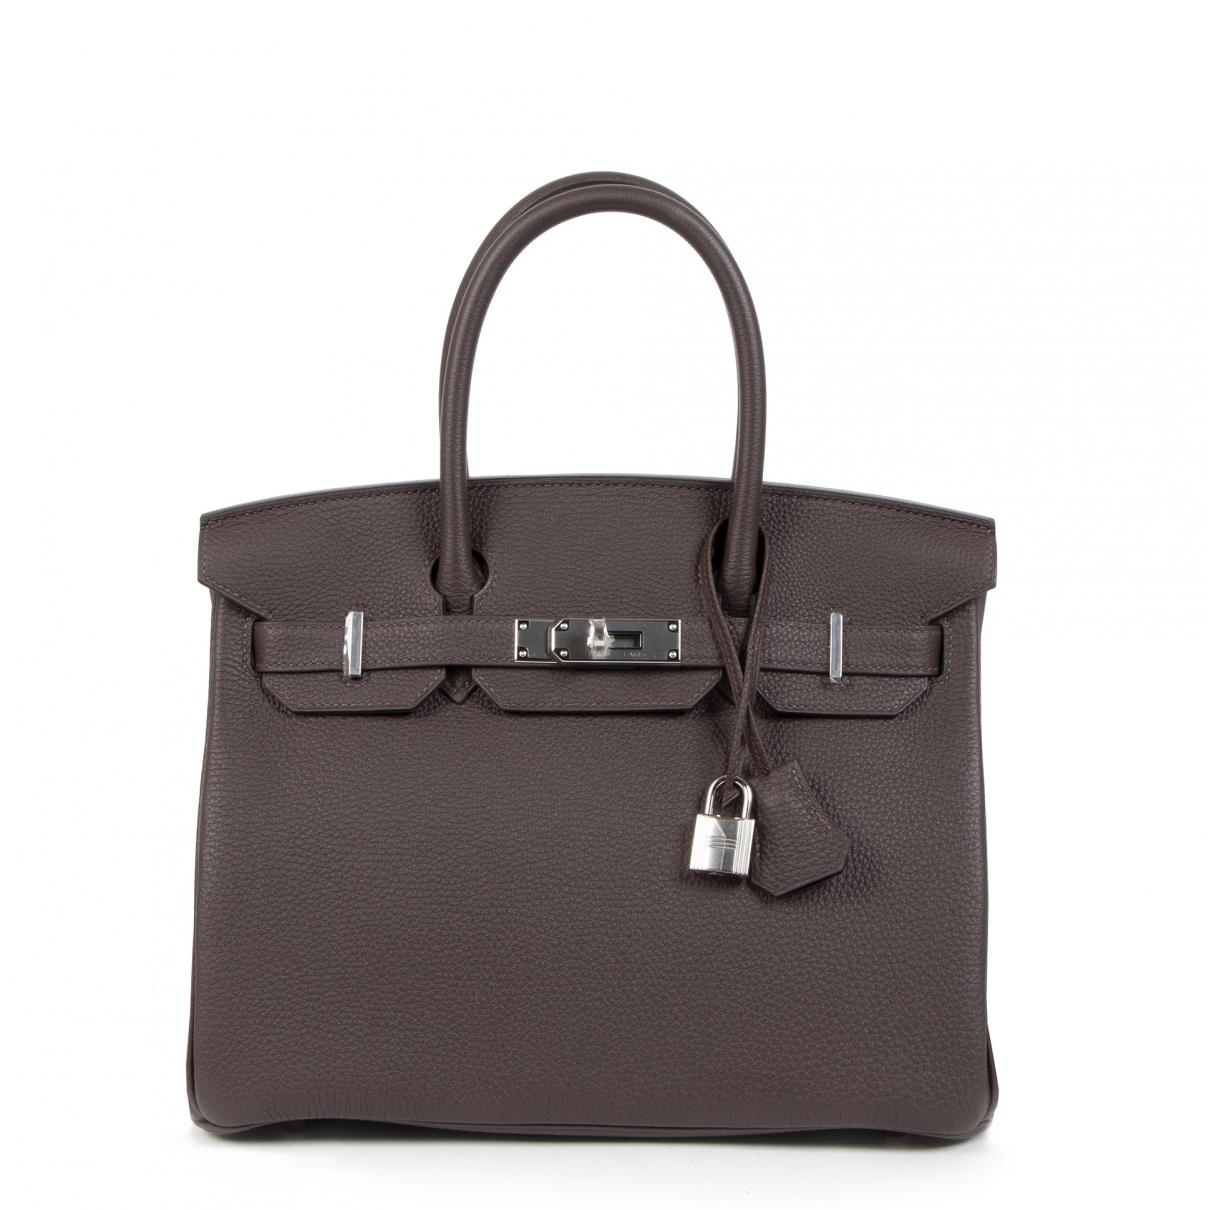 Hermes - Sac a main Birkin 30 pour femme en cuir - marron